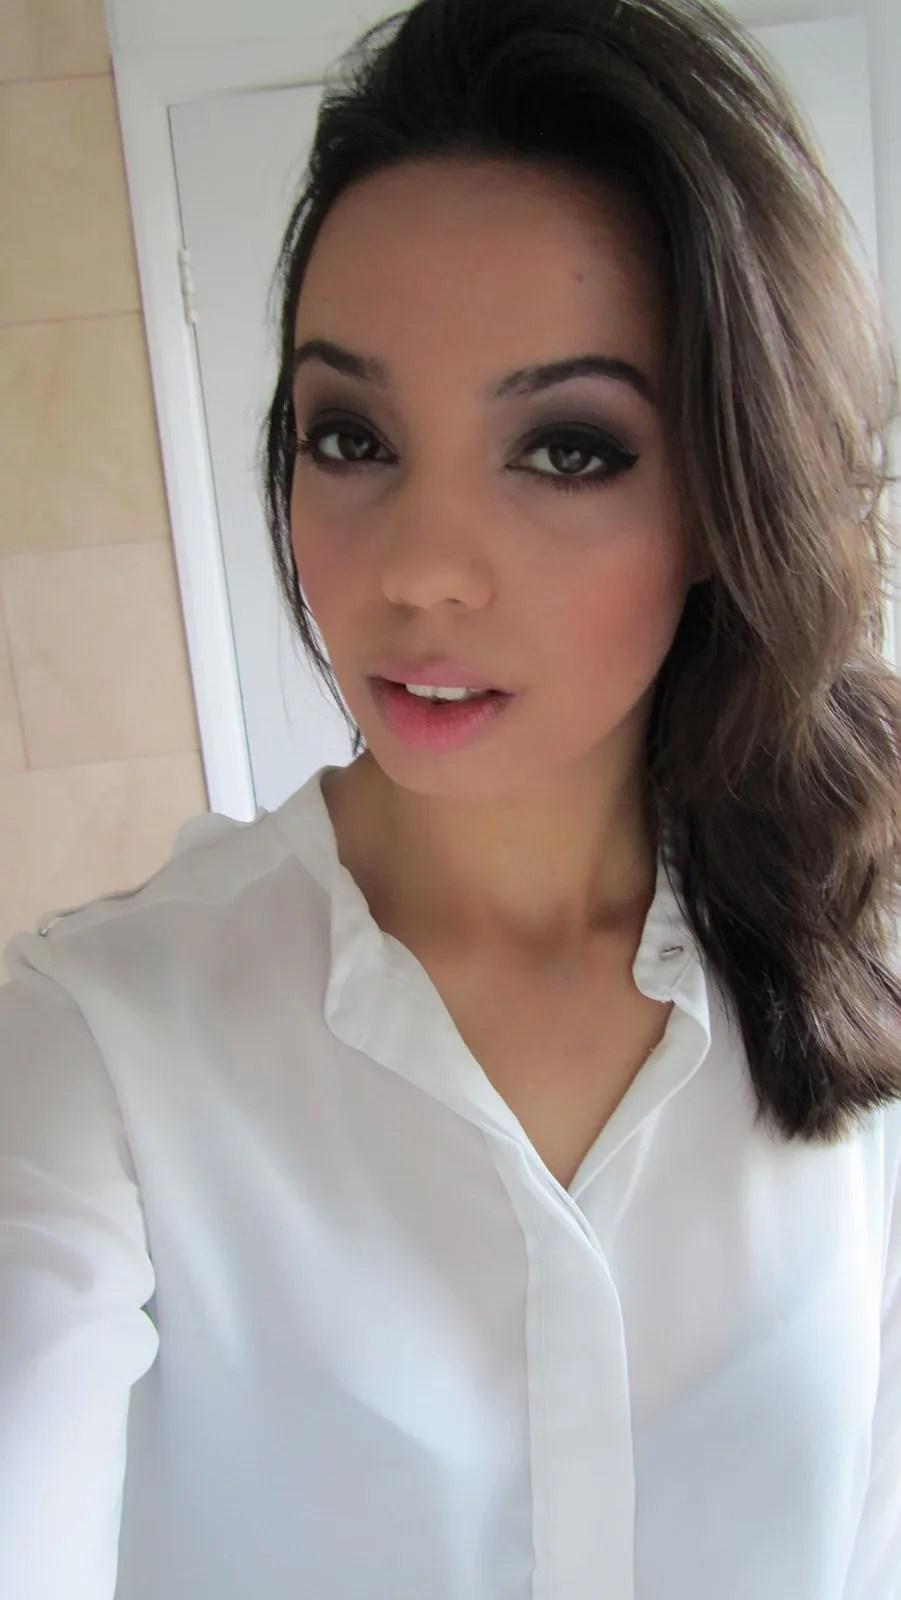 BeautyPlus_20170419175134_save.jpg